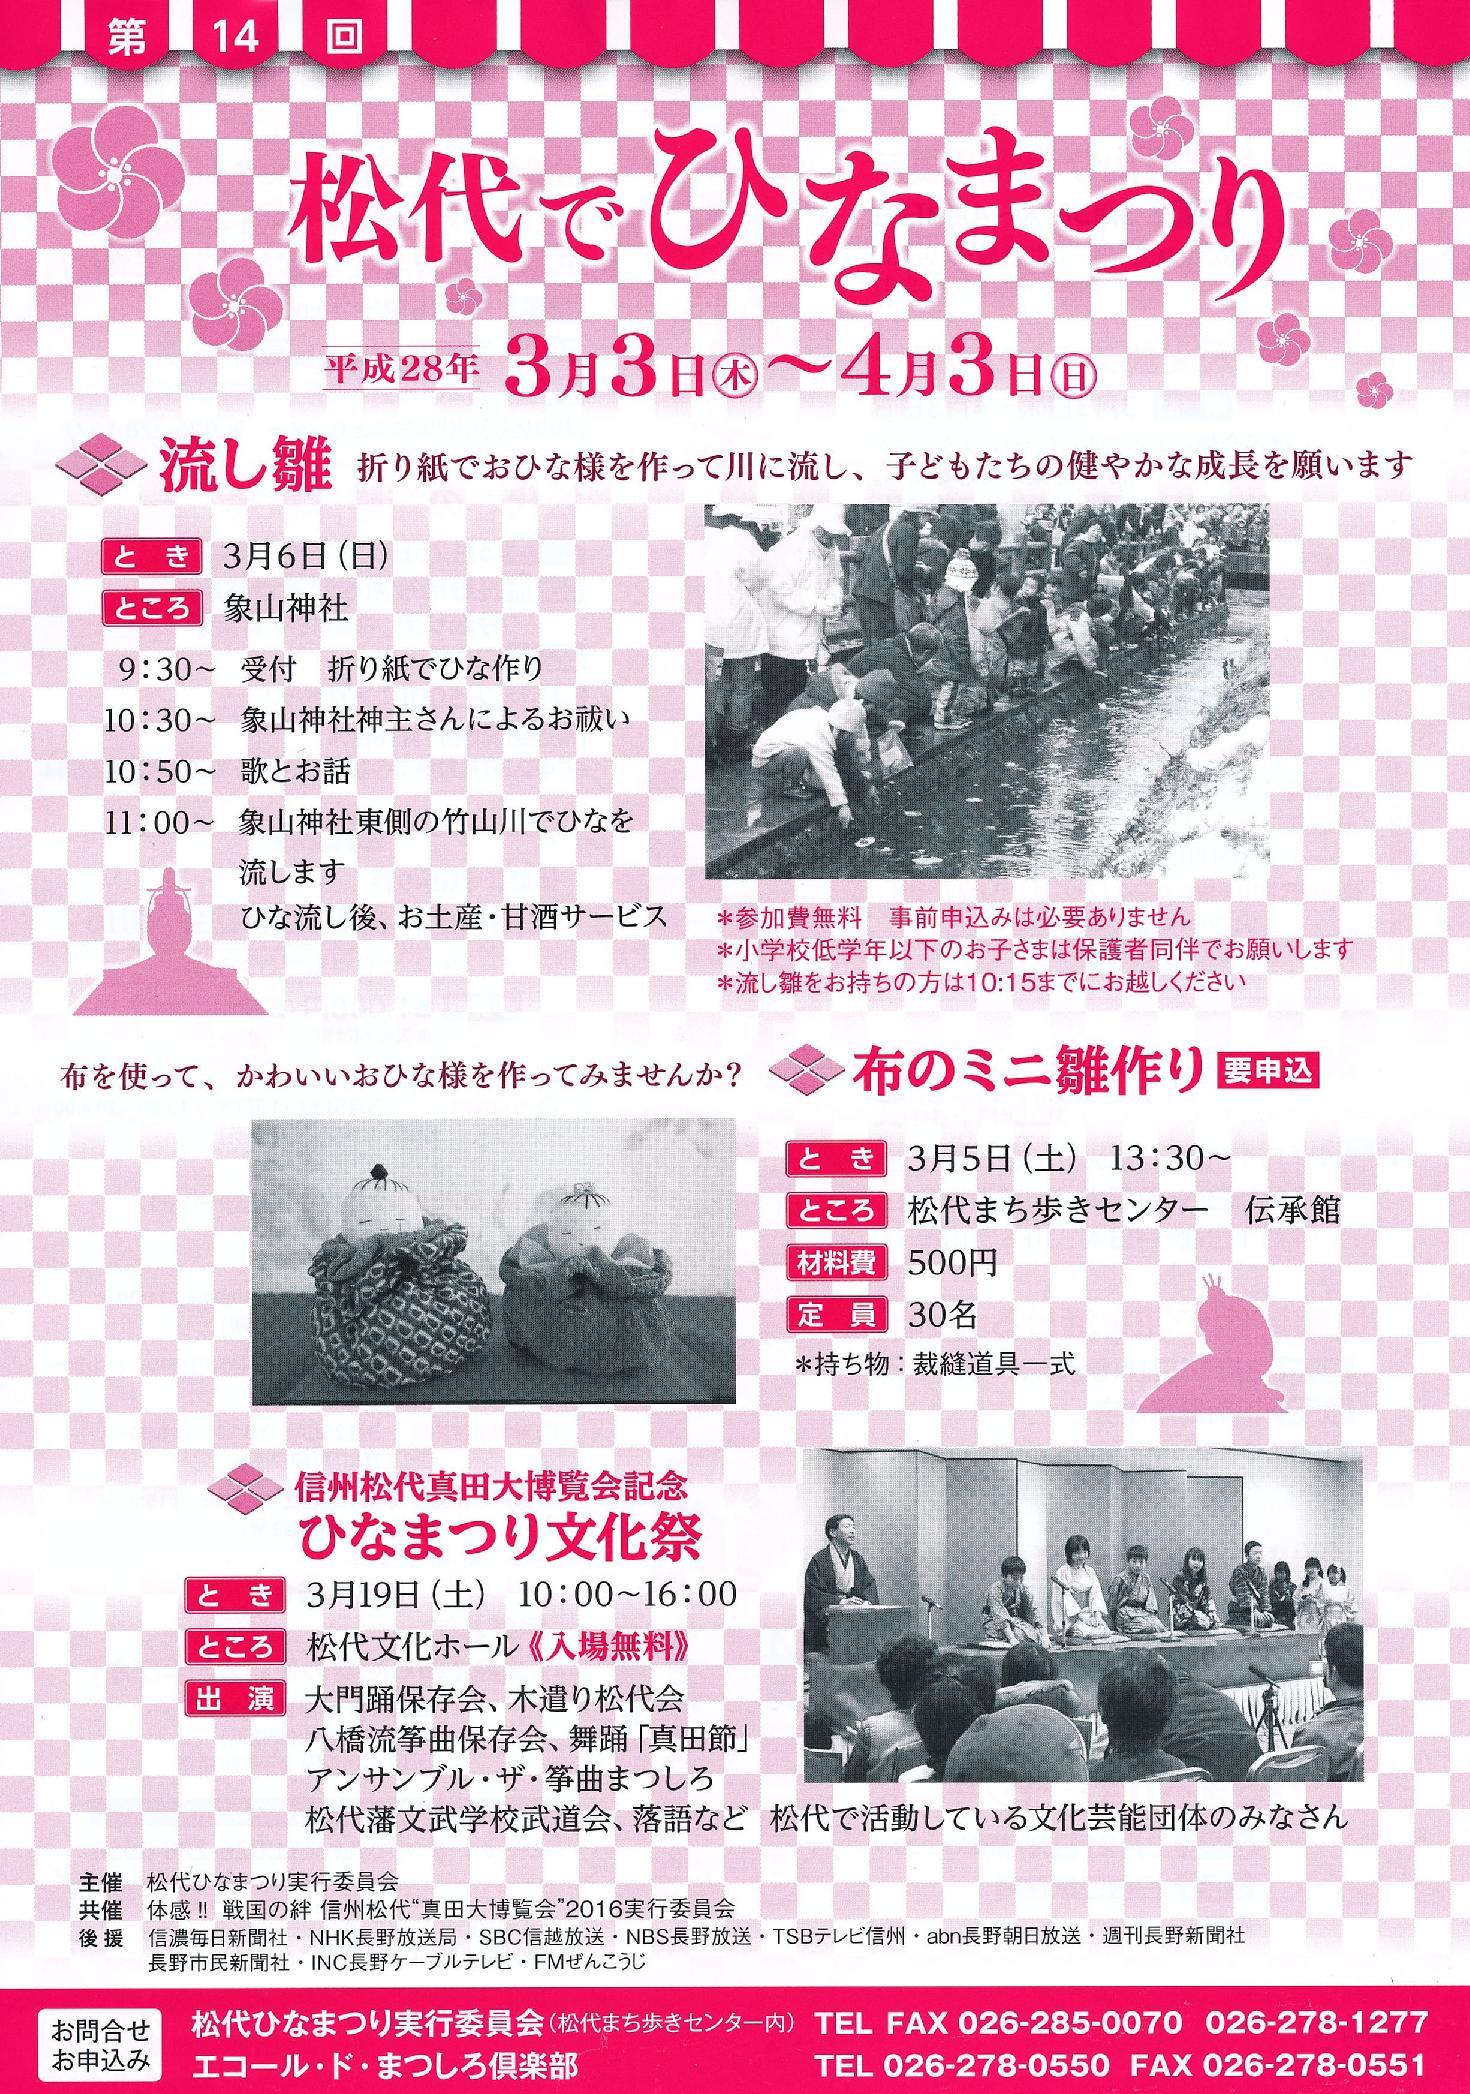 20160303-0403hinamatsuri_01_201602031206221.jpg